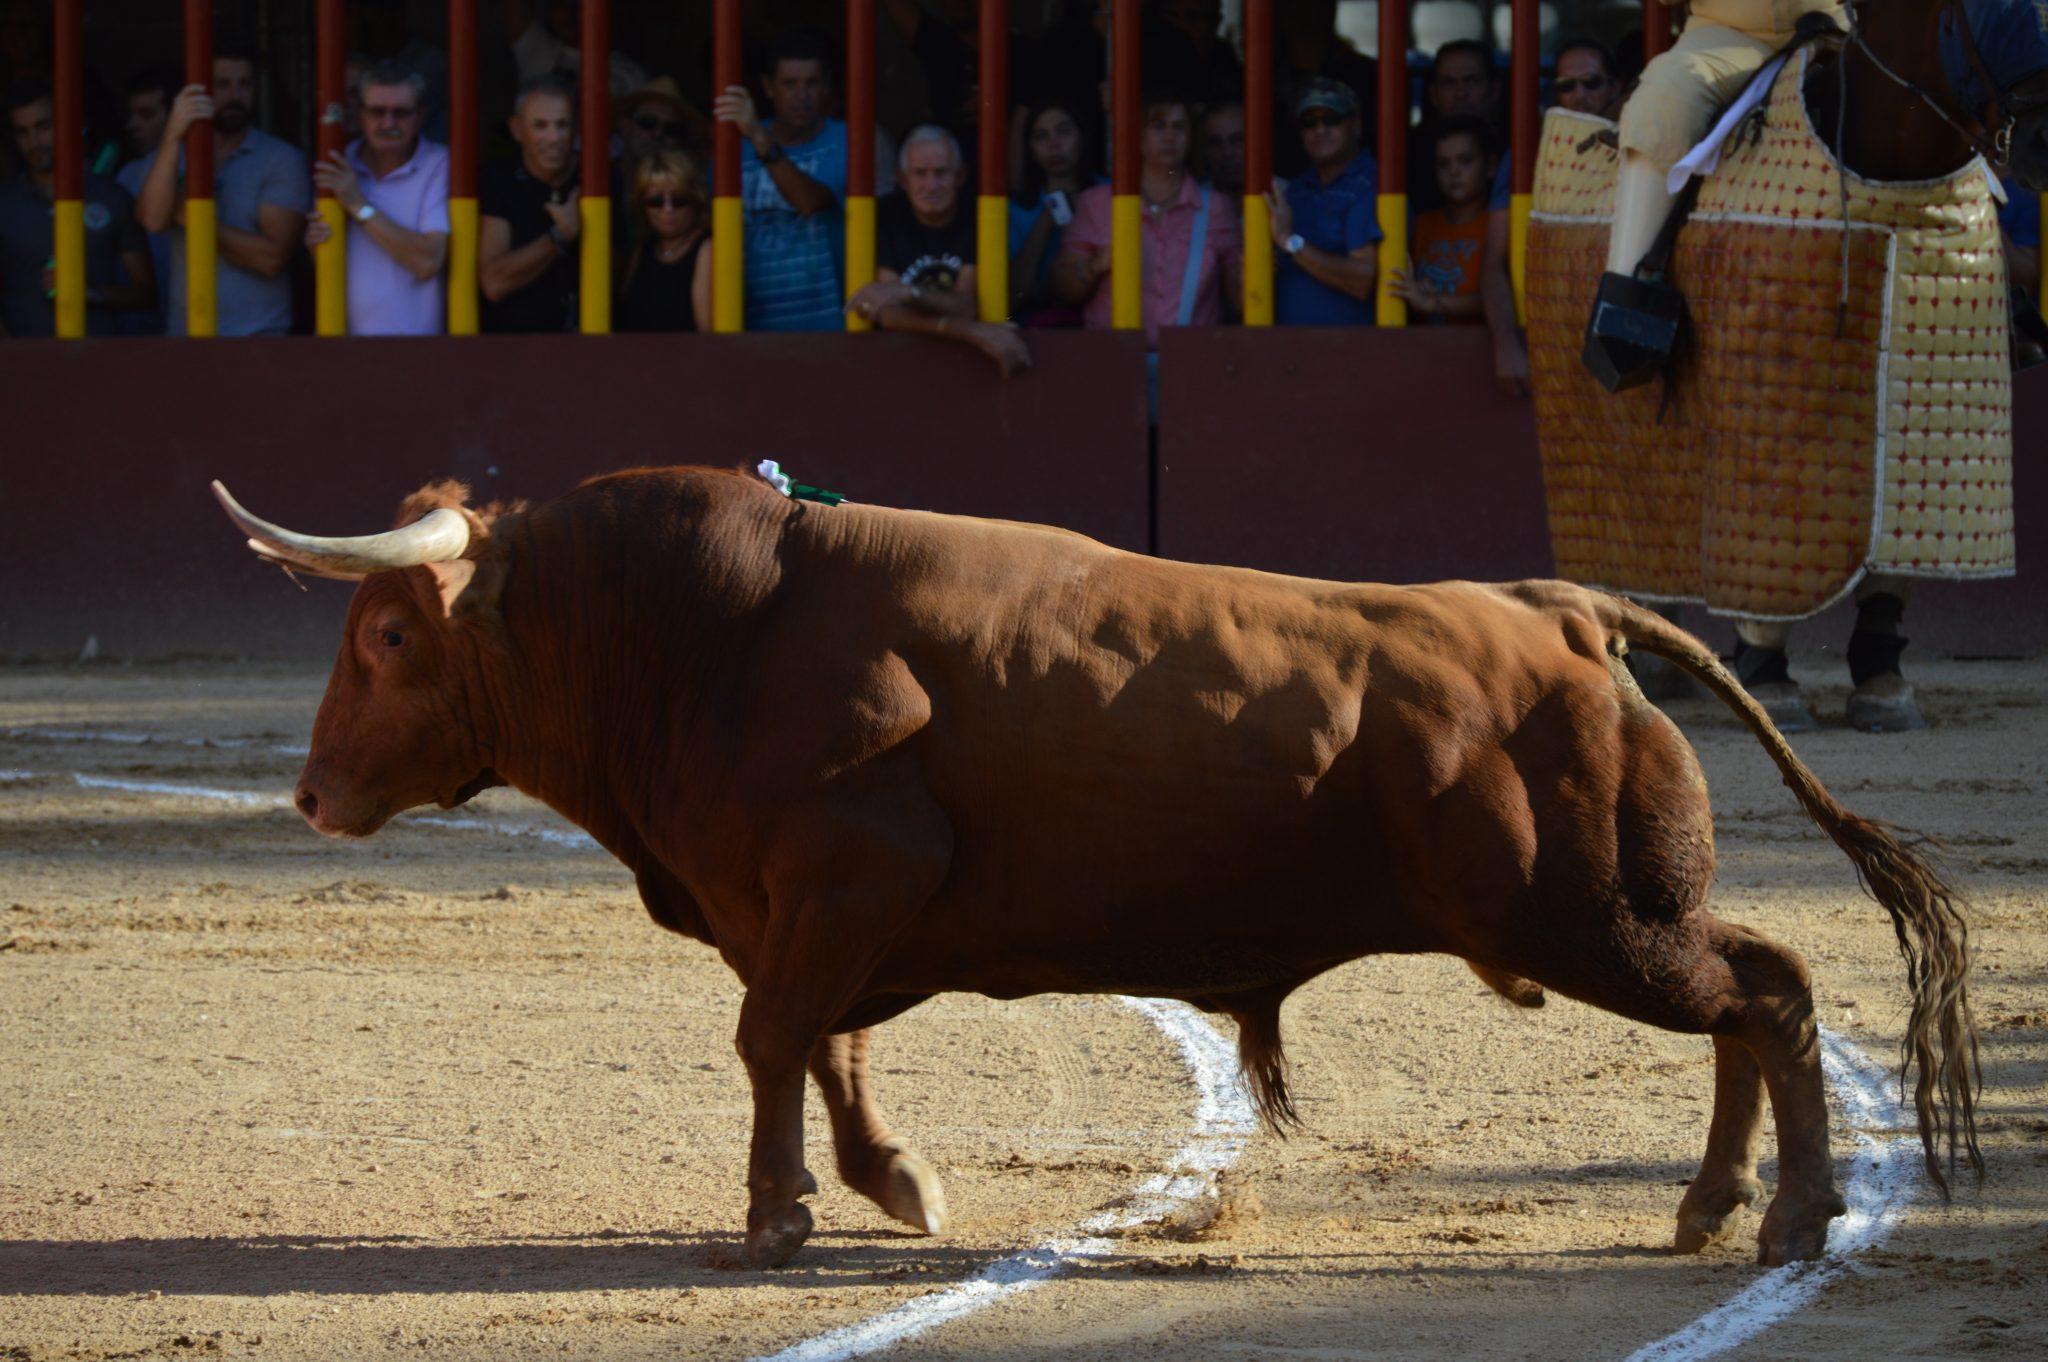 Madrid Bull experience visit bulls